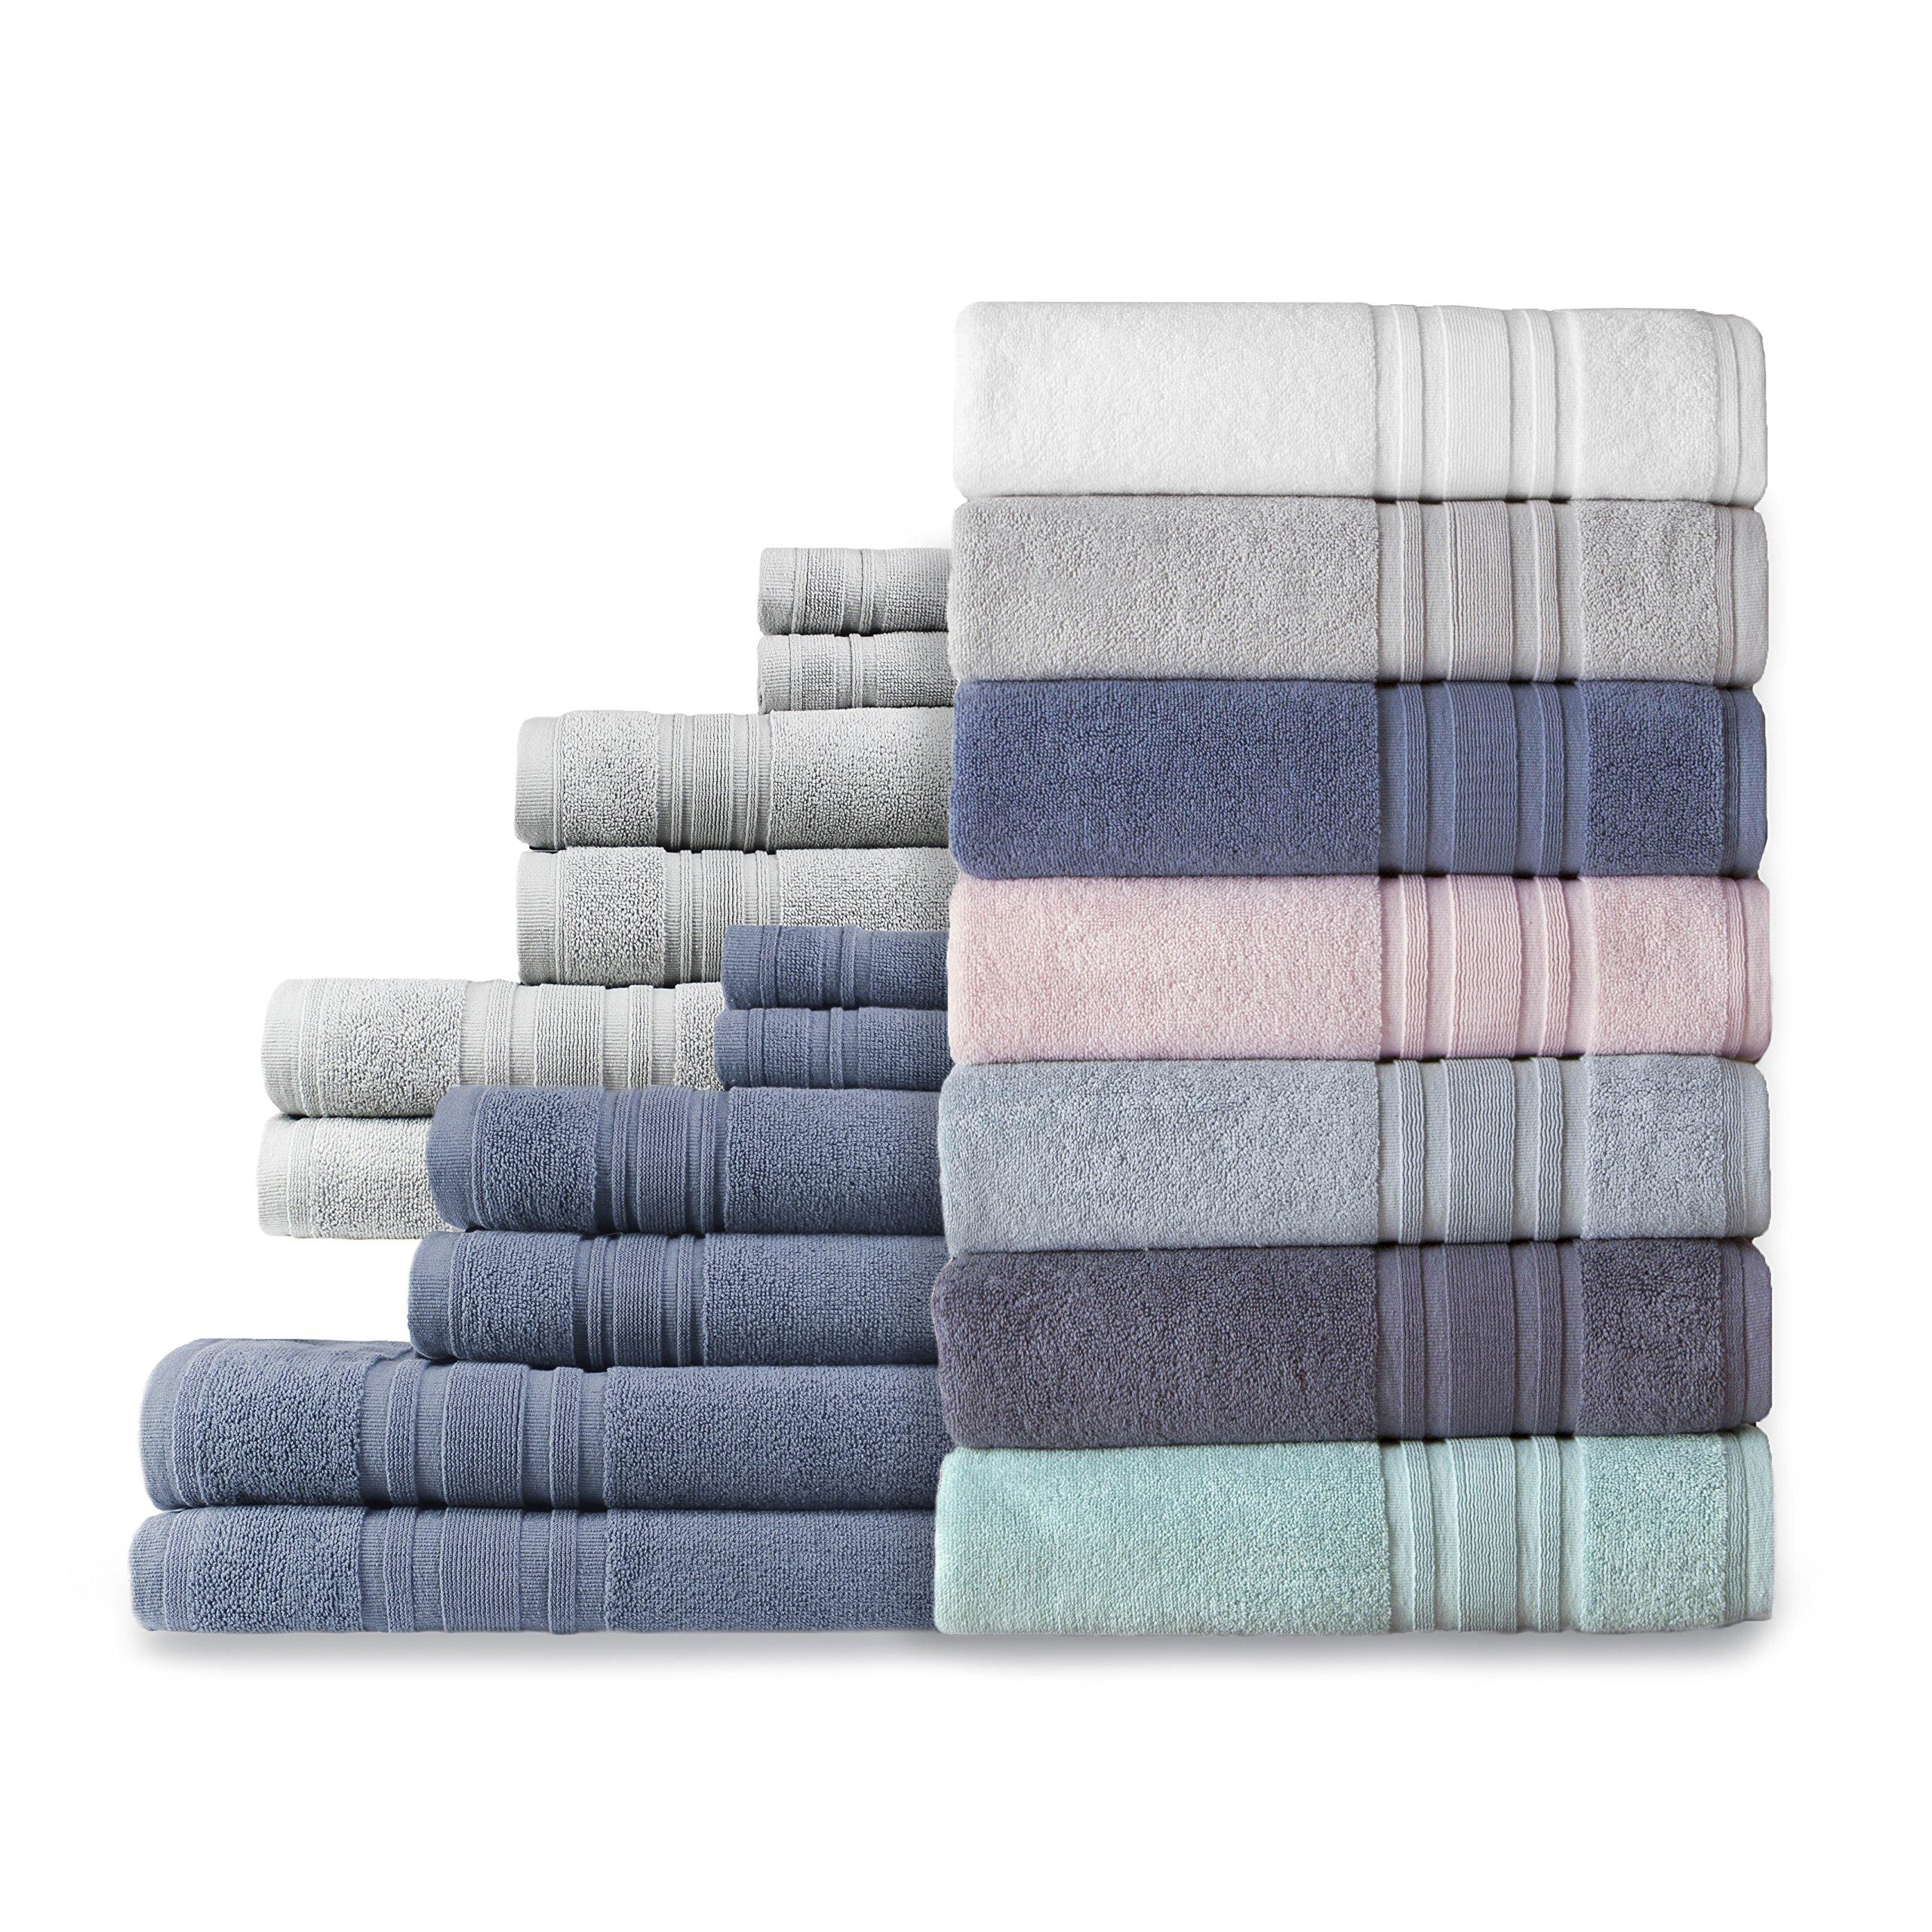 Melange Home Luxury Hotel Cotton Turkish Towel Collection (Bath Sheet Set) Slate Blue Set of 6